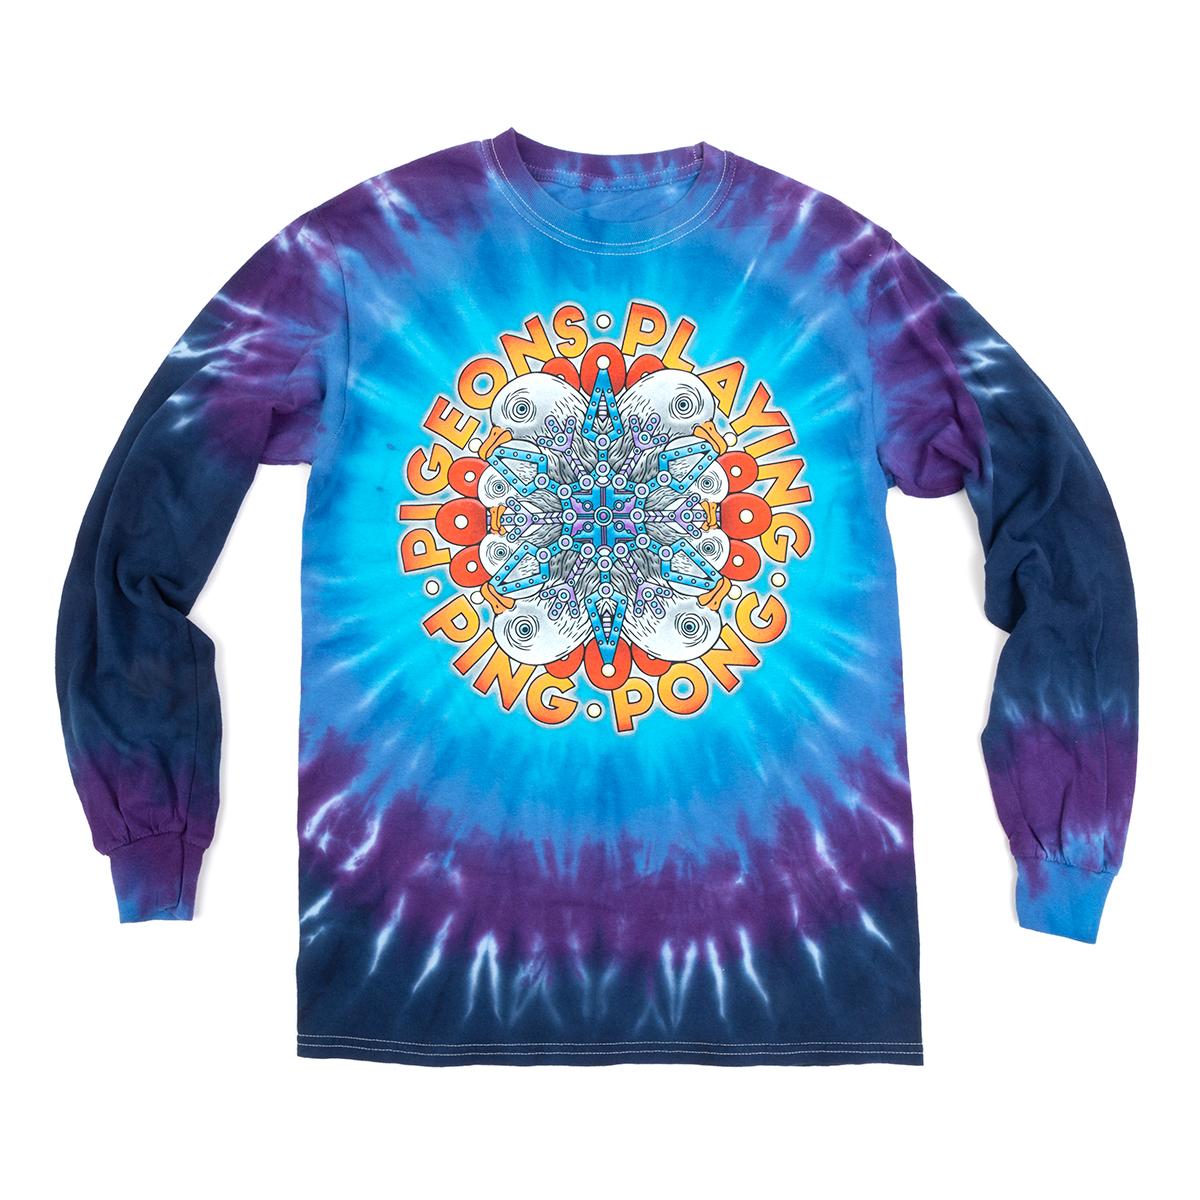 Long Sleeve Tie-dye T-shirt